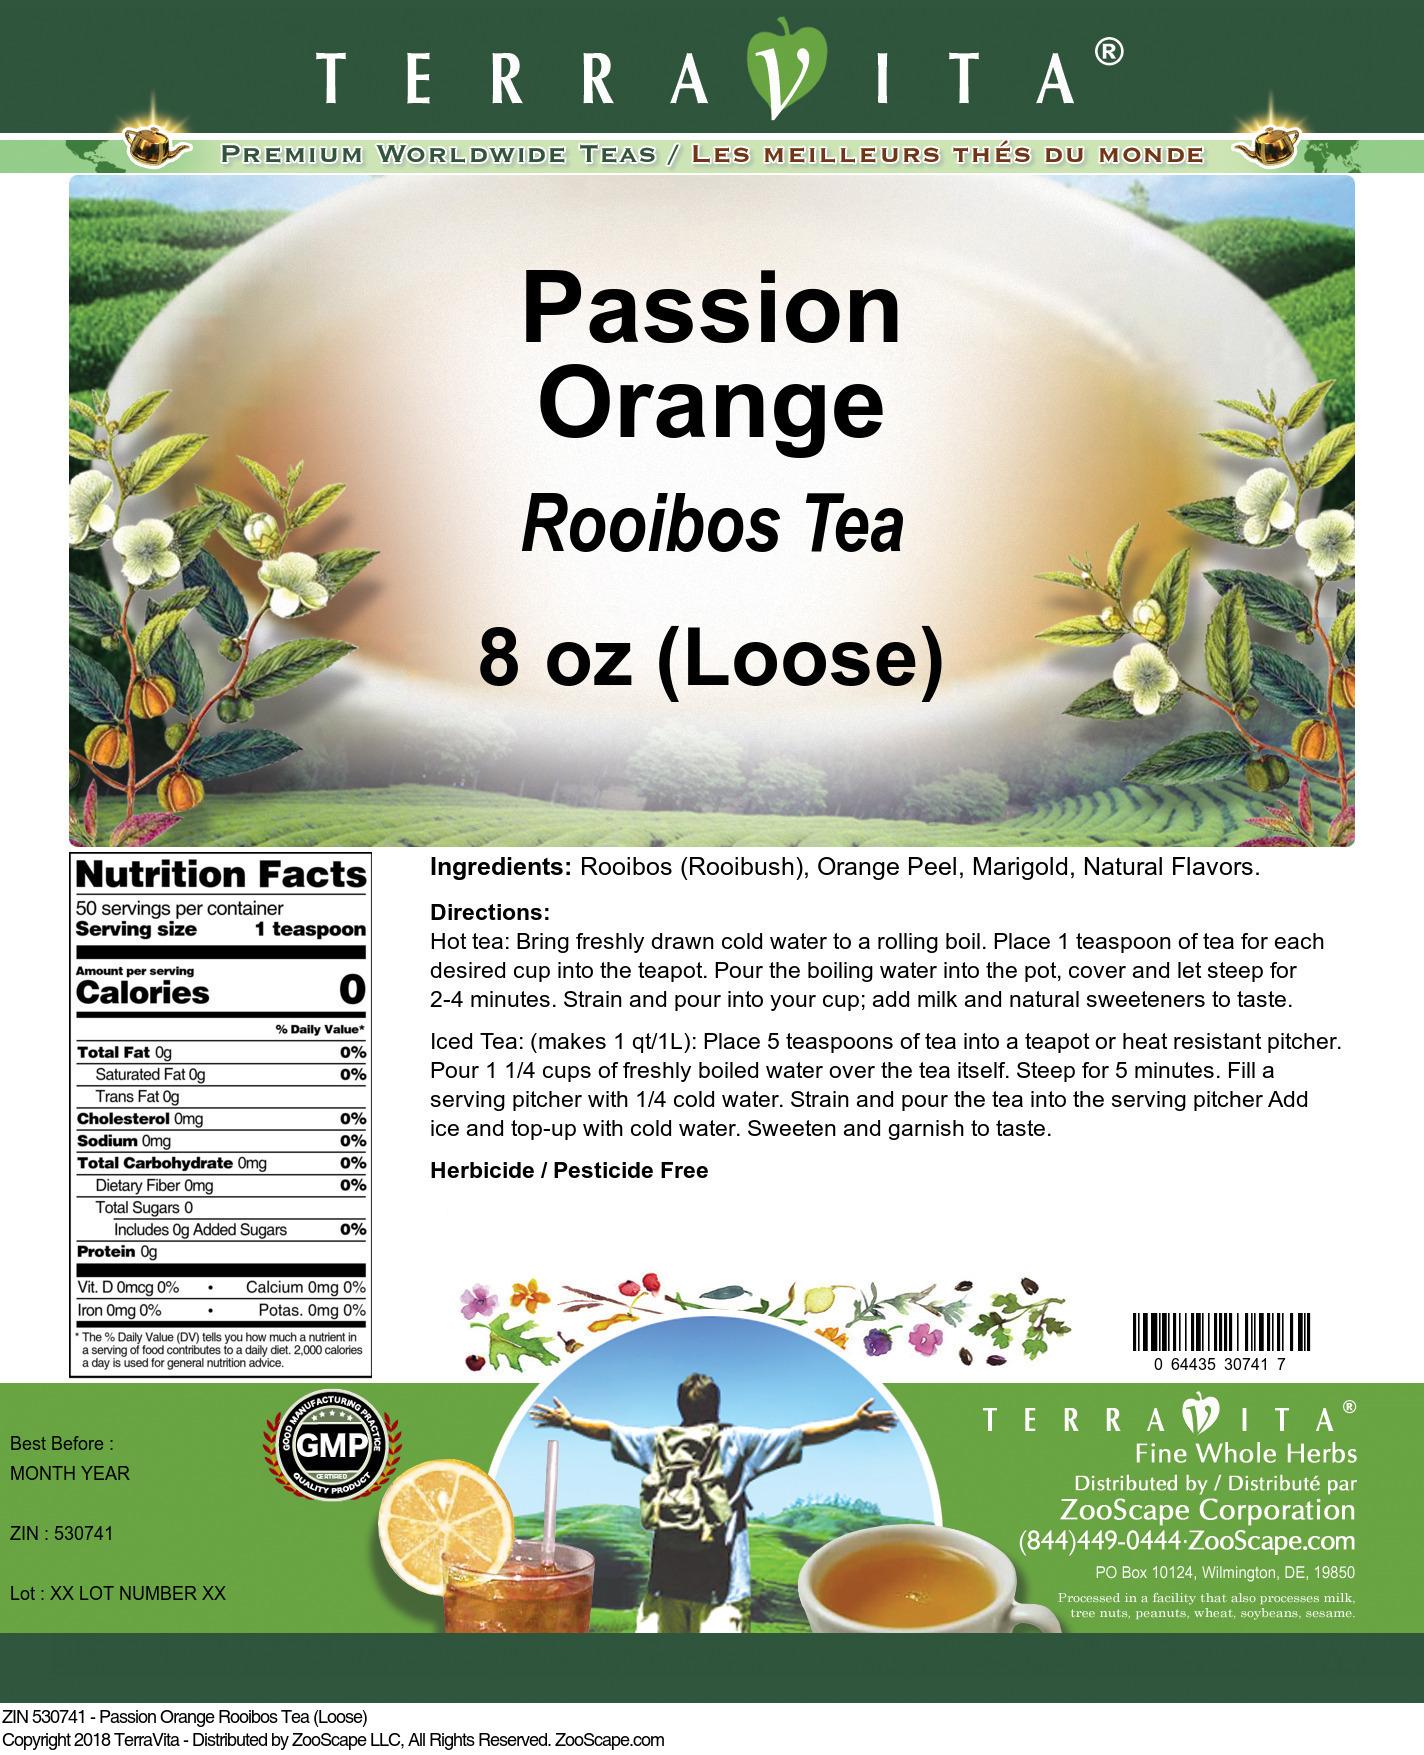 Passion Orange Rooibos Tea (Loose)